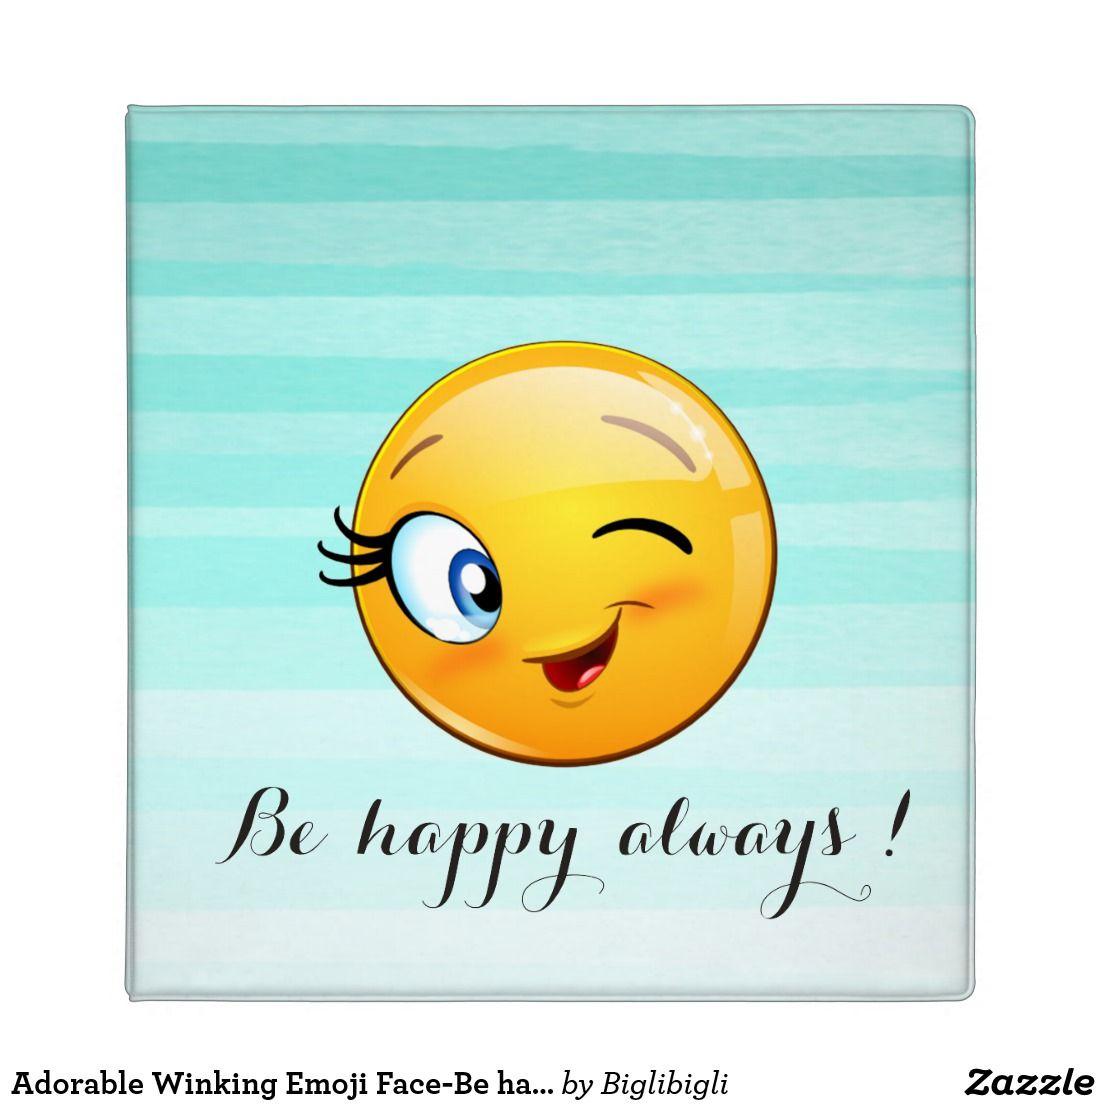 Adorable Winking Emoji Face Be Happy Always 3 Ring Binder Zazzle Com In 2021 Winking Emoji Happy Face Quote Emoji